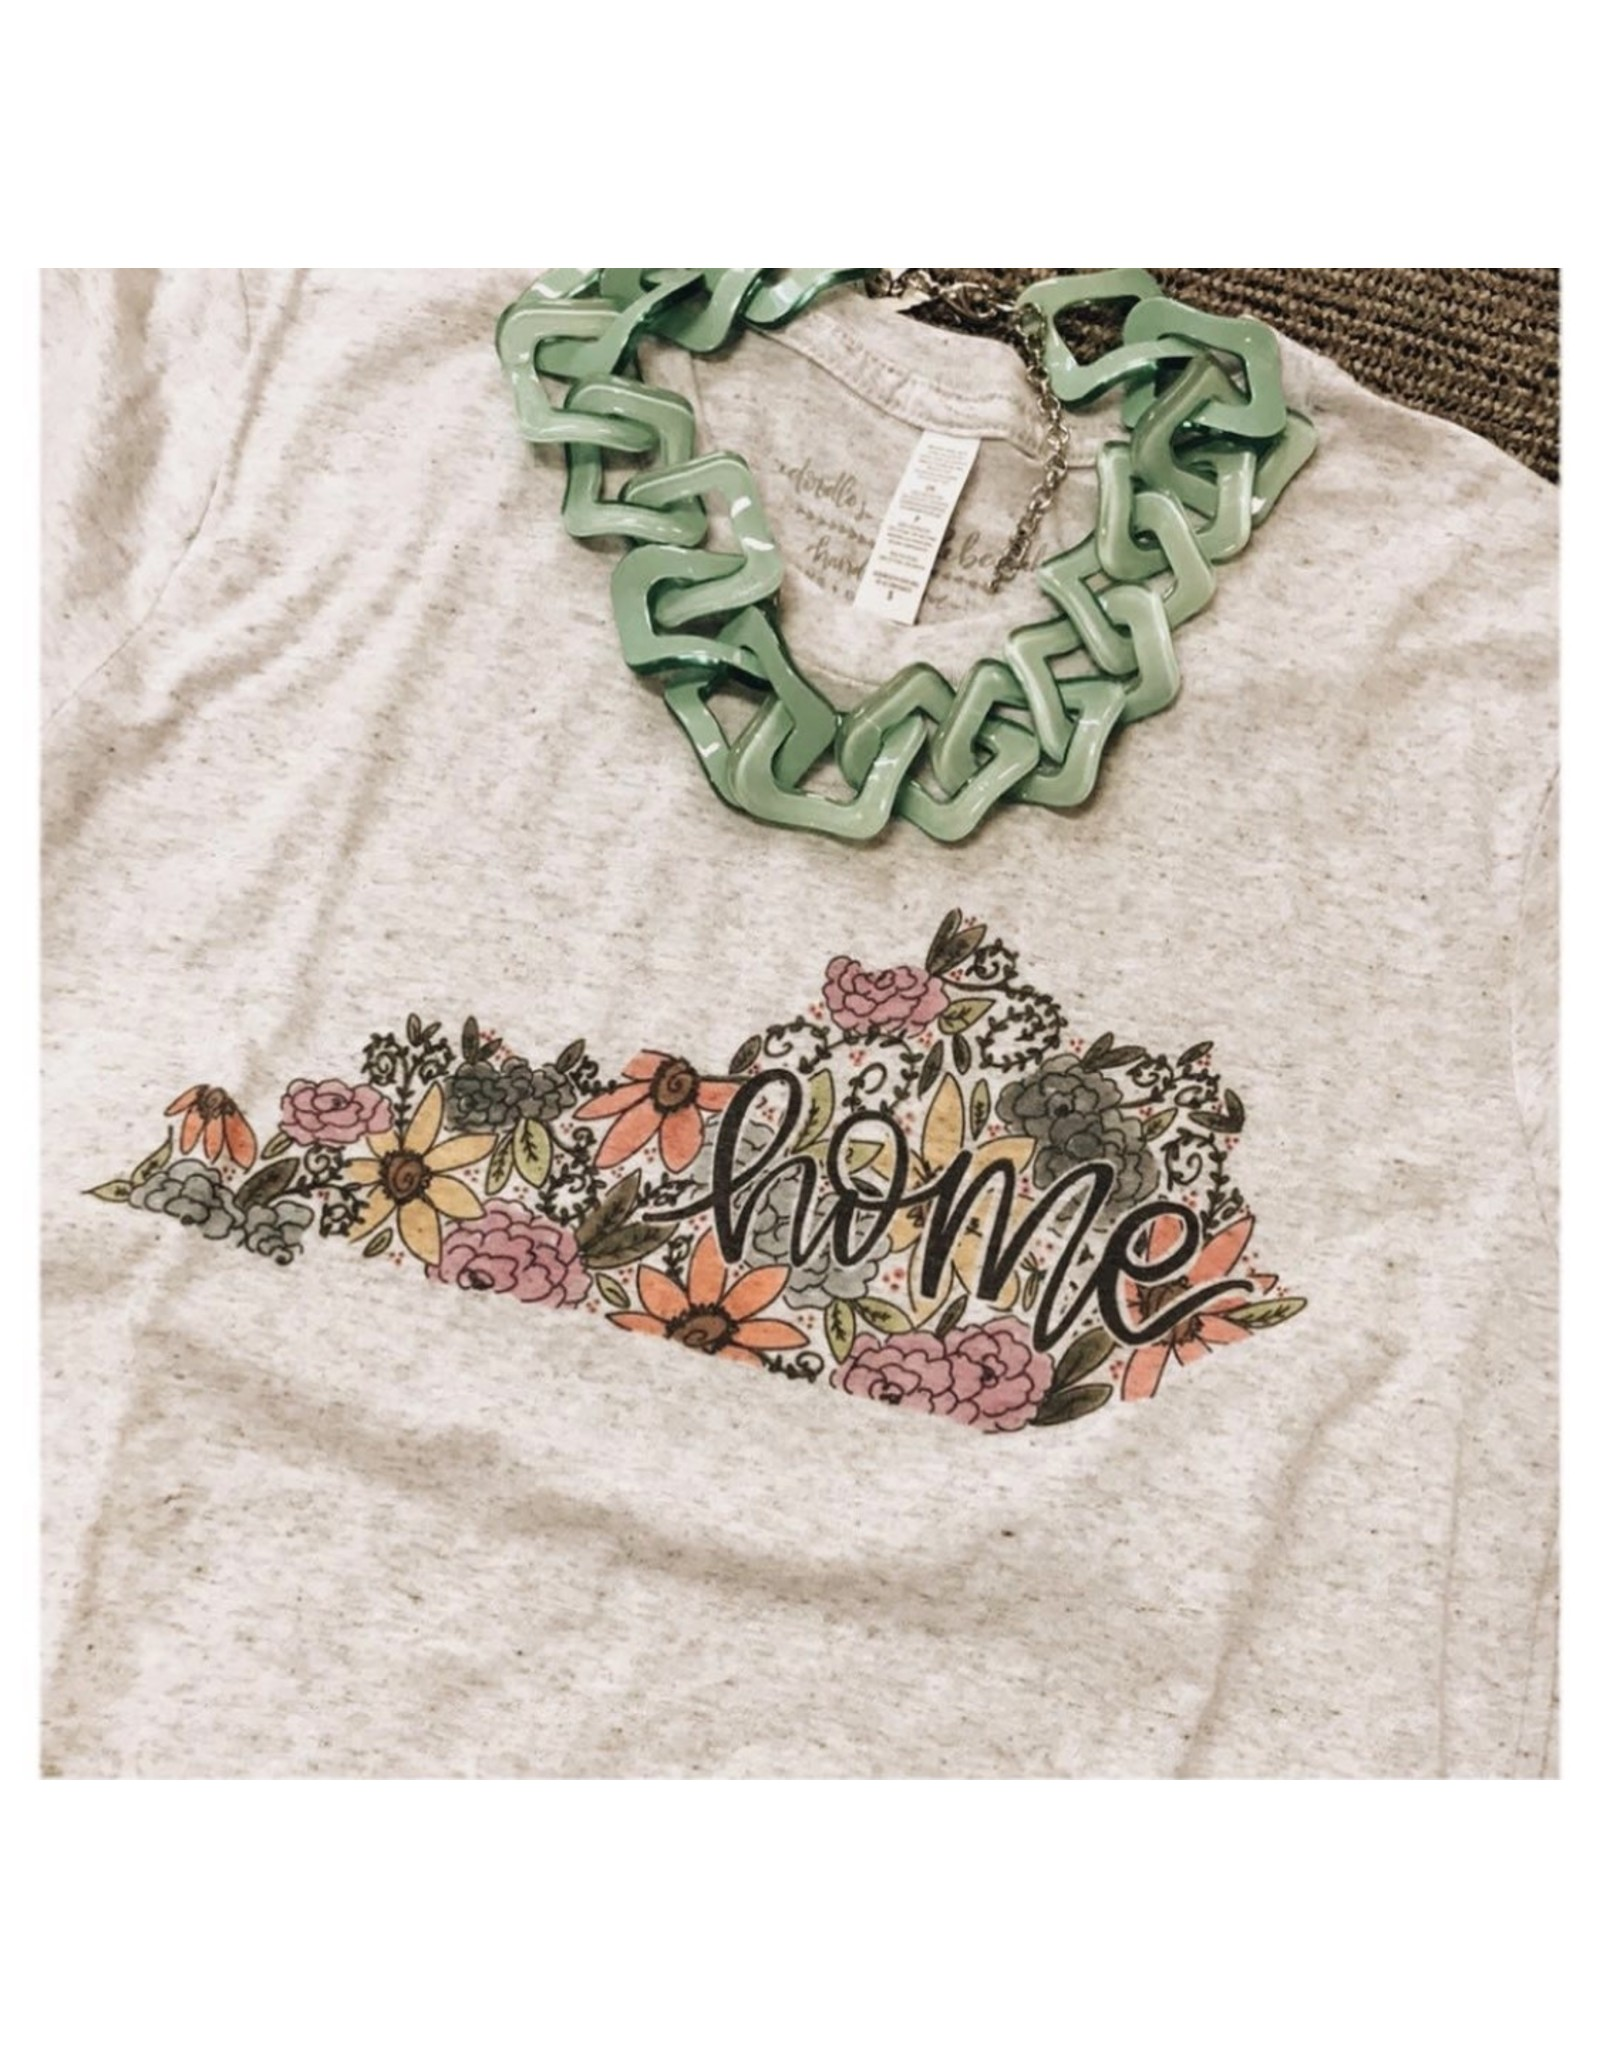 Kentucky Floral short sleeve tee (medium)